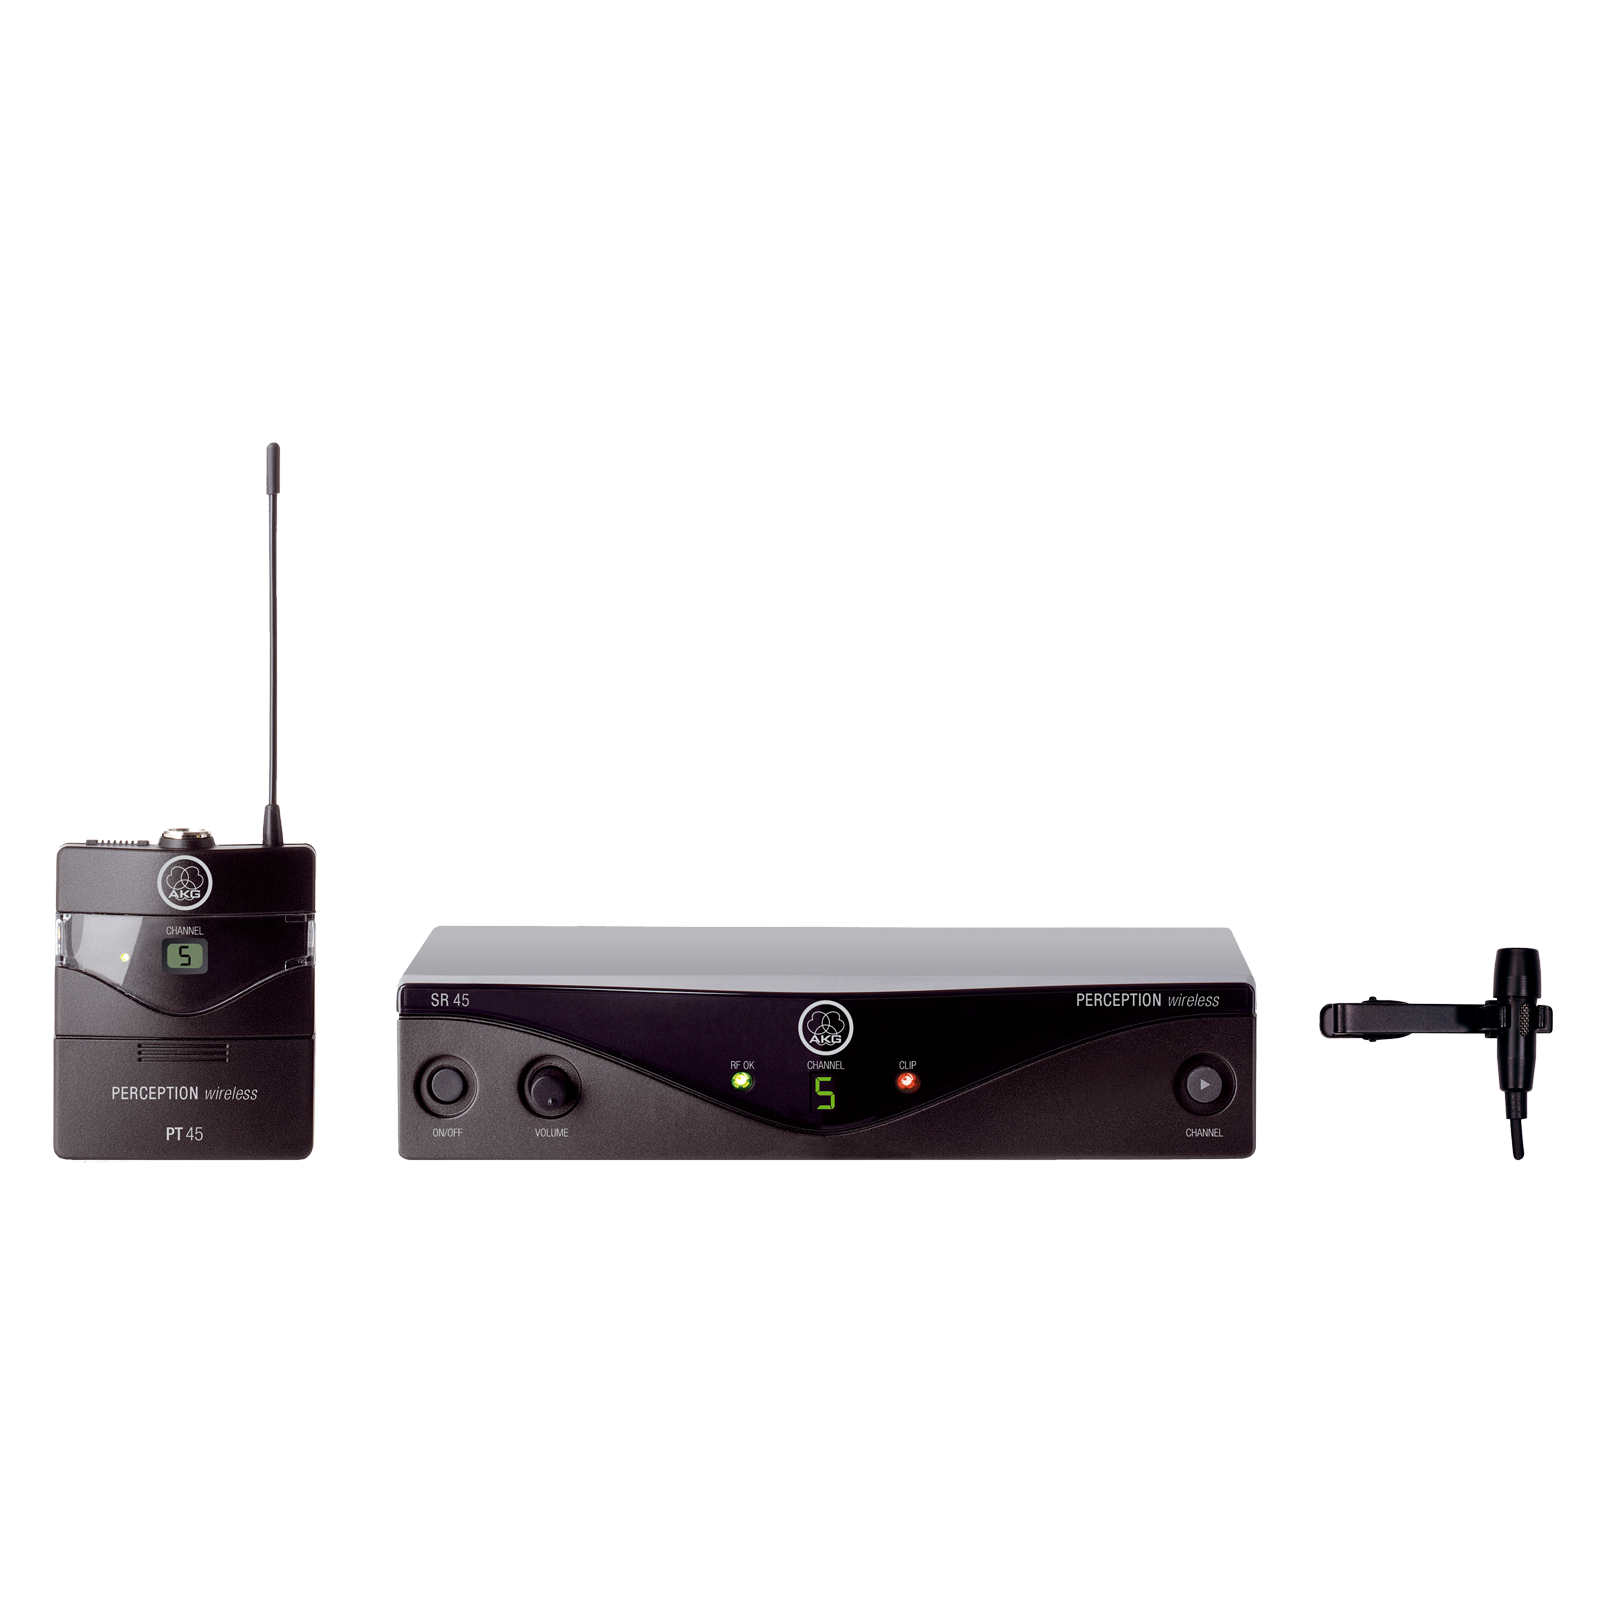 Perception Wireless 45 Presenter Set Band-C2 - Black - High-performance wireless microphone system - Hero